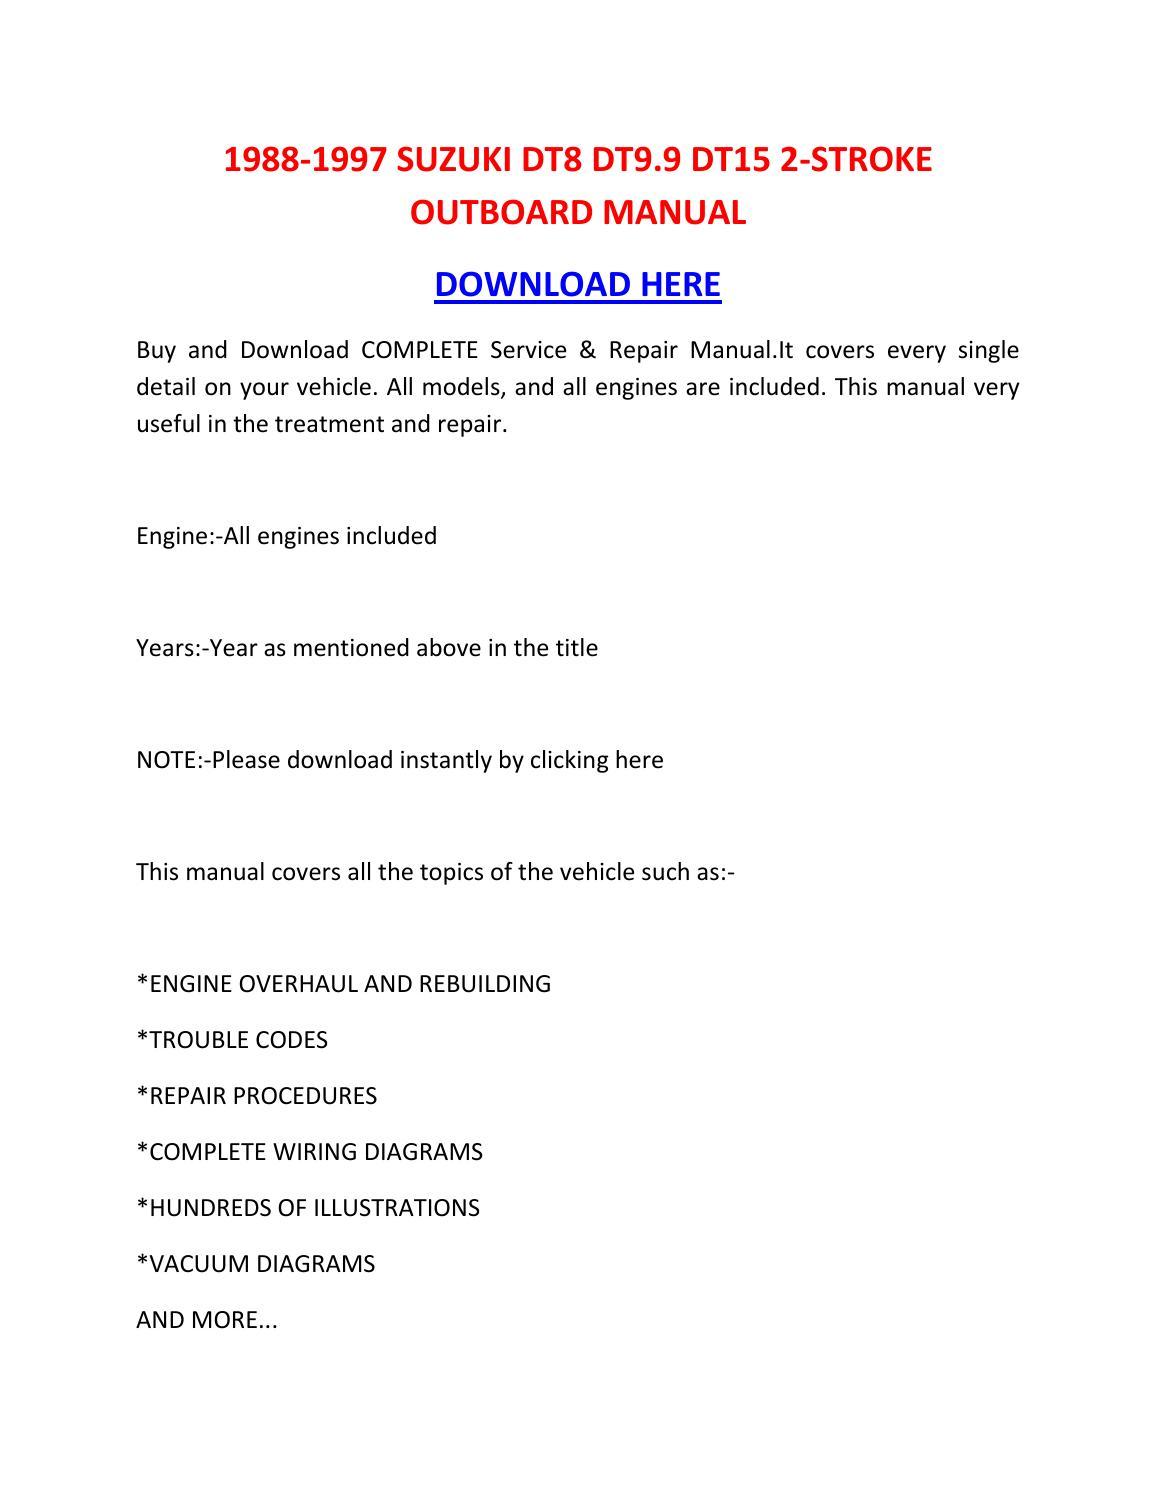 Suzuki Outboard 9 9 manual